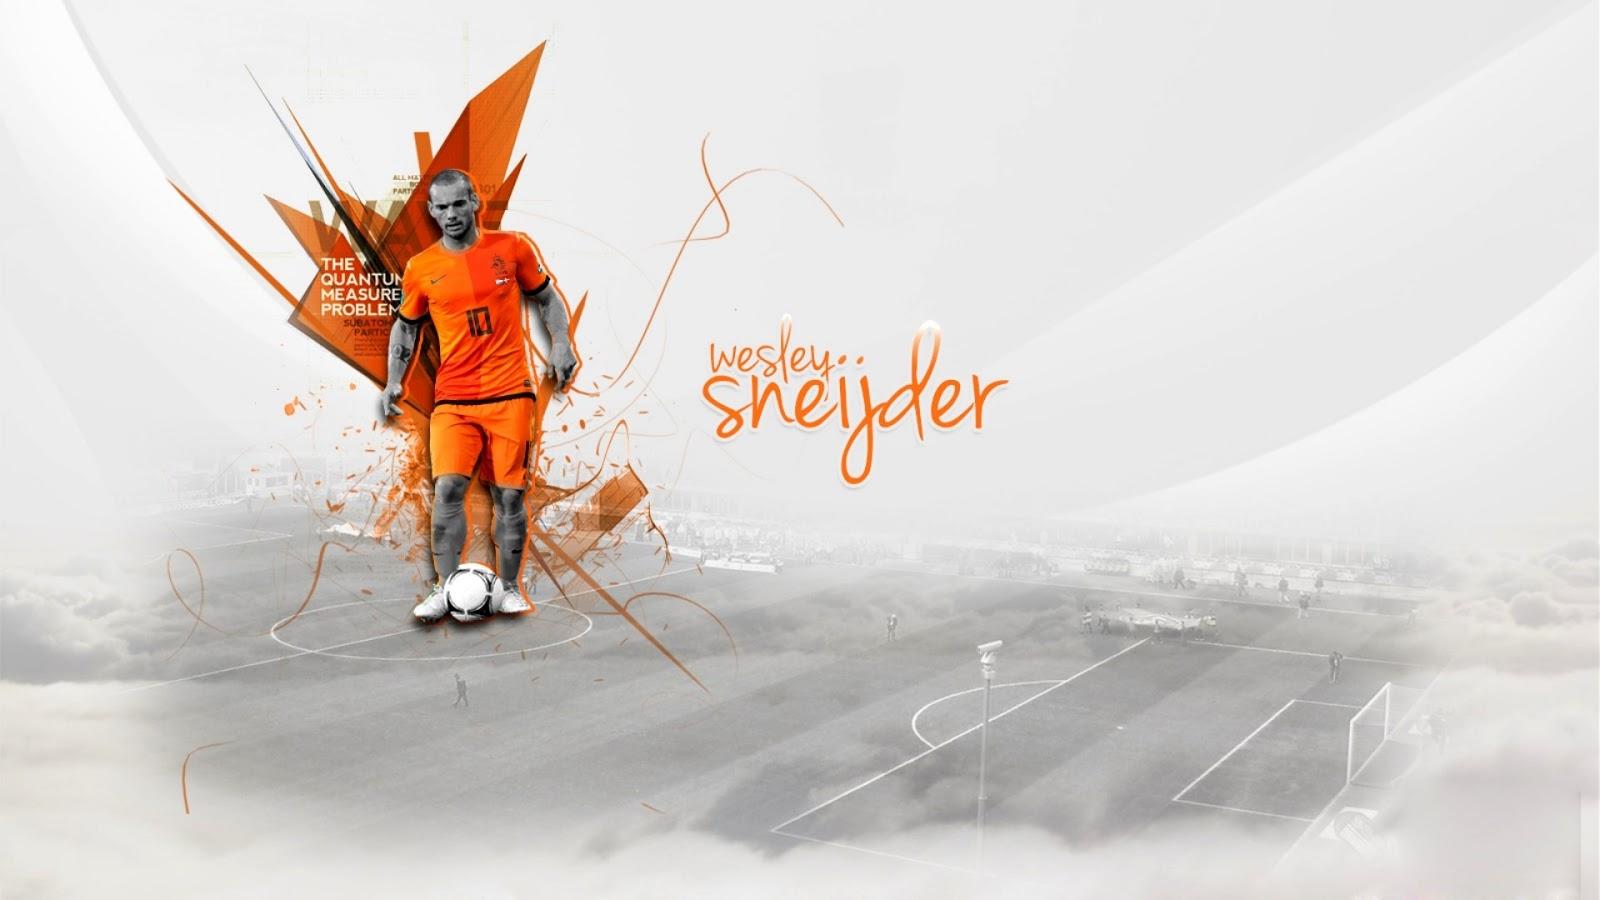 wesley+sneijder+galatasaray+resimleri+rooteto+10 Wesley Sneijder Galatasaray HD Resimleri